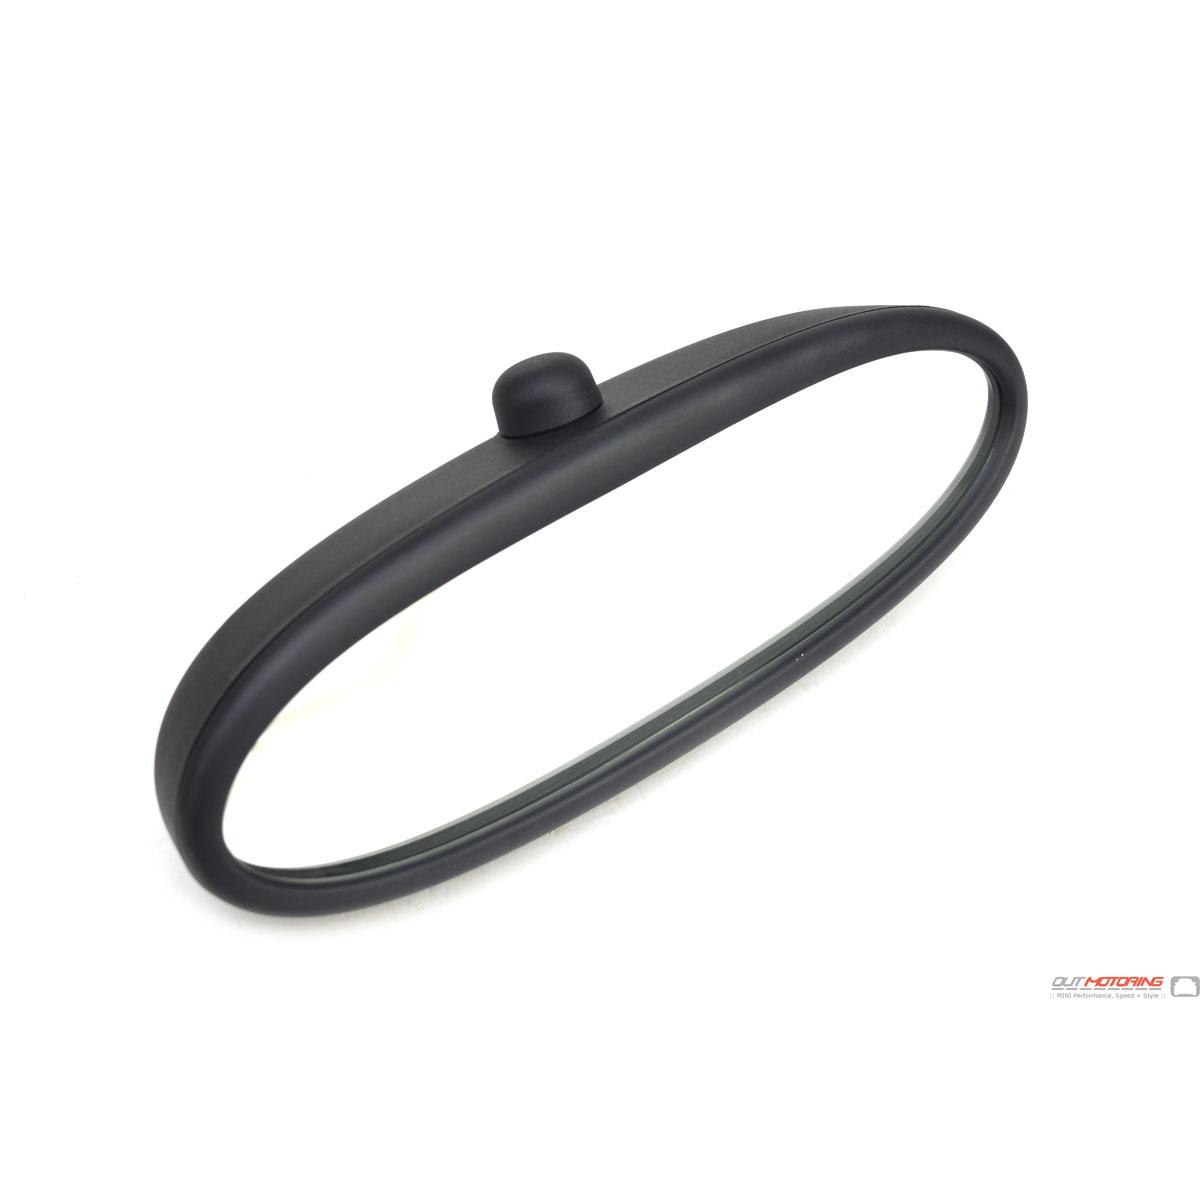 51169134379 MINI Cooper Replacement Rear View Mirror